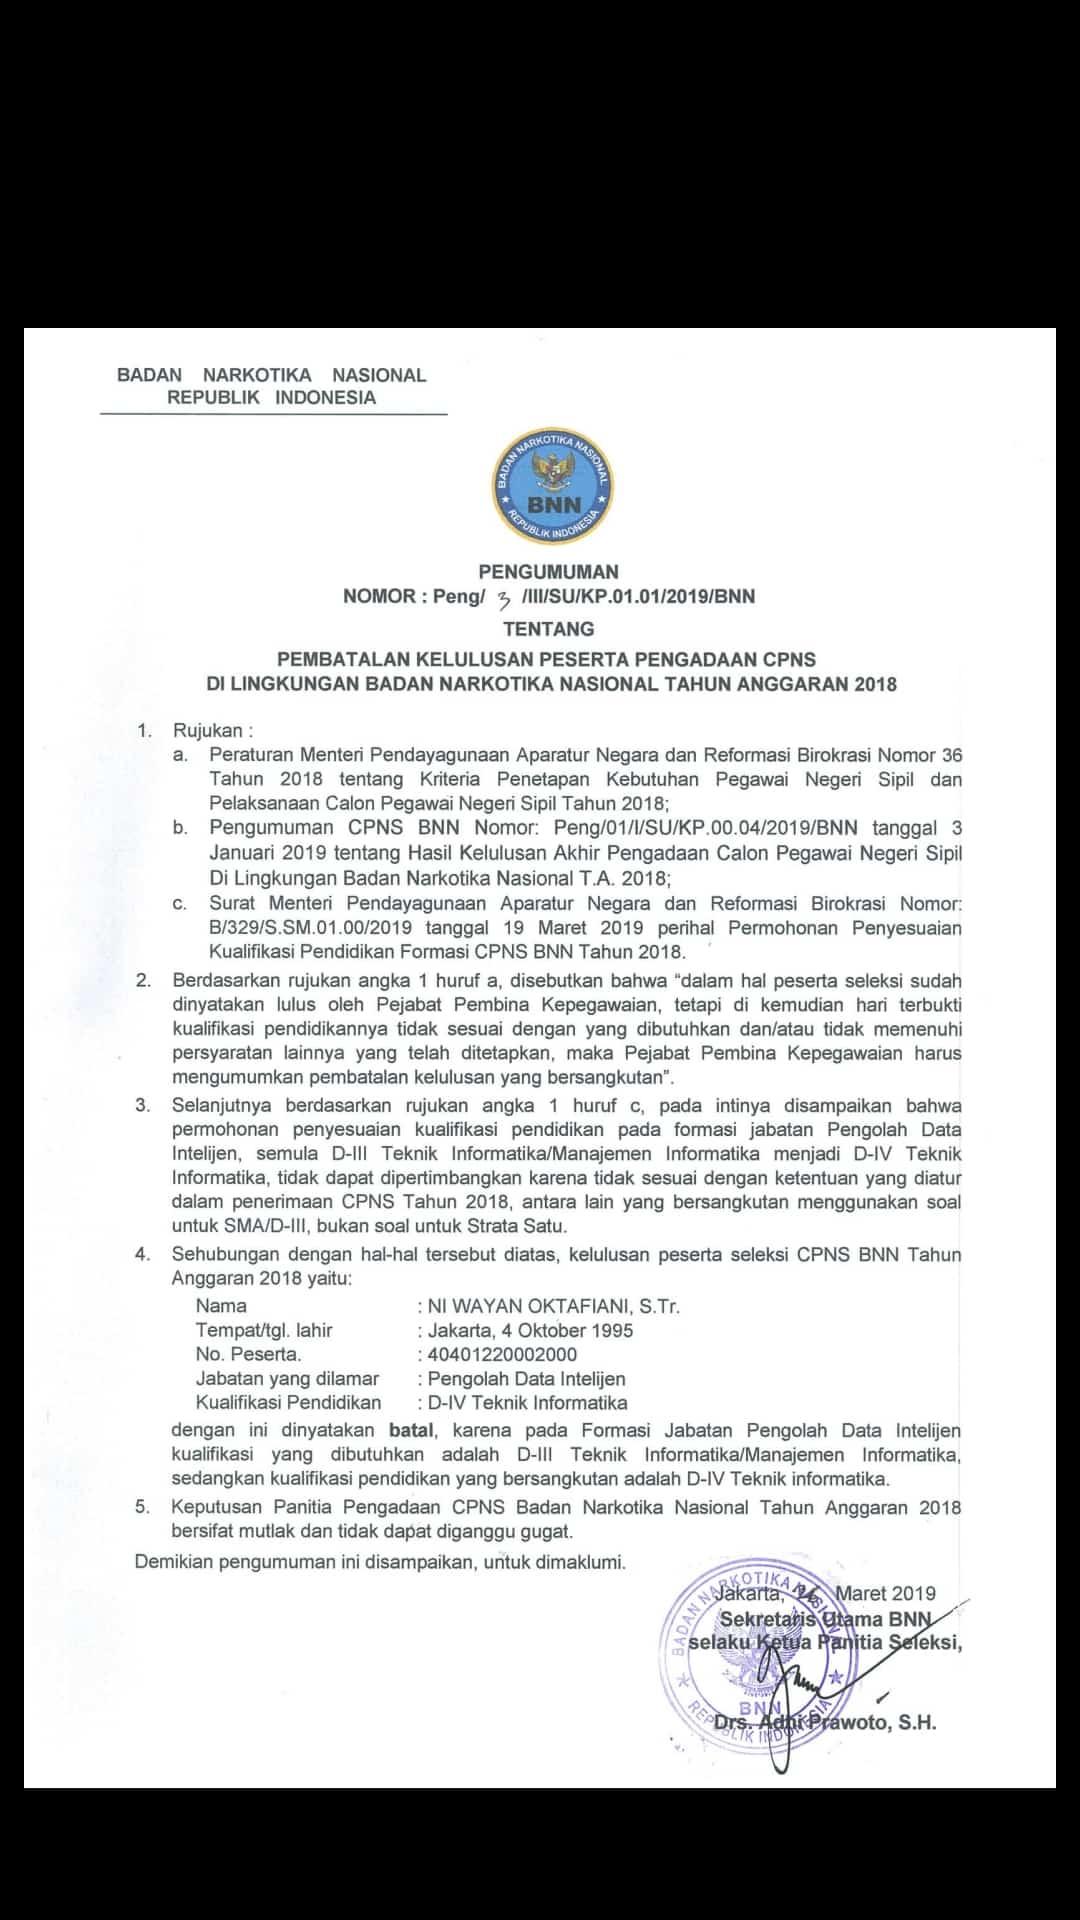 pengumuman pembatalan kelulusan peserta pengadaan CPNS di lingkungan BNN TA 2018.